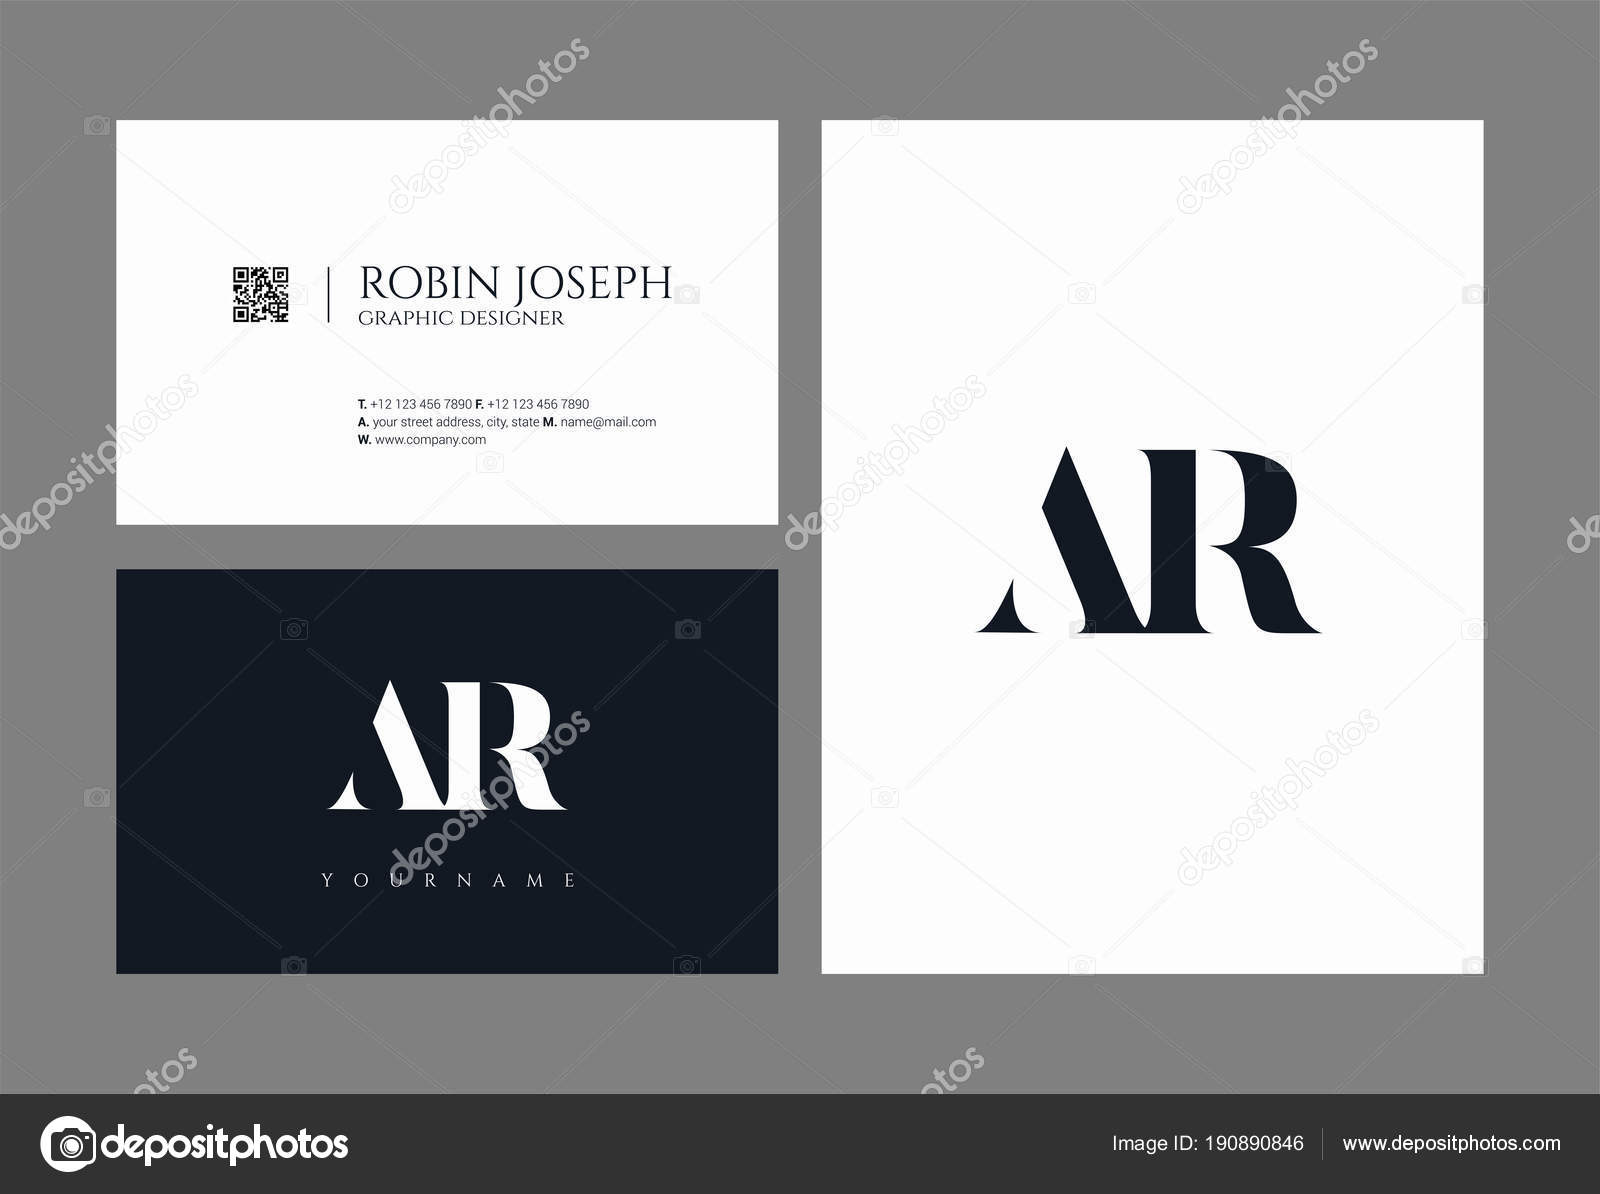 Business Card Template — Stock Vector © ajayandzyn@gmail.com #190890846